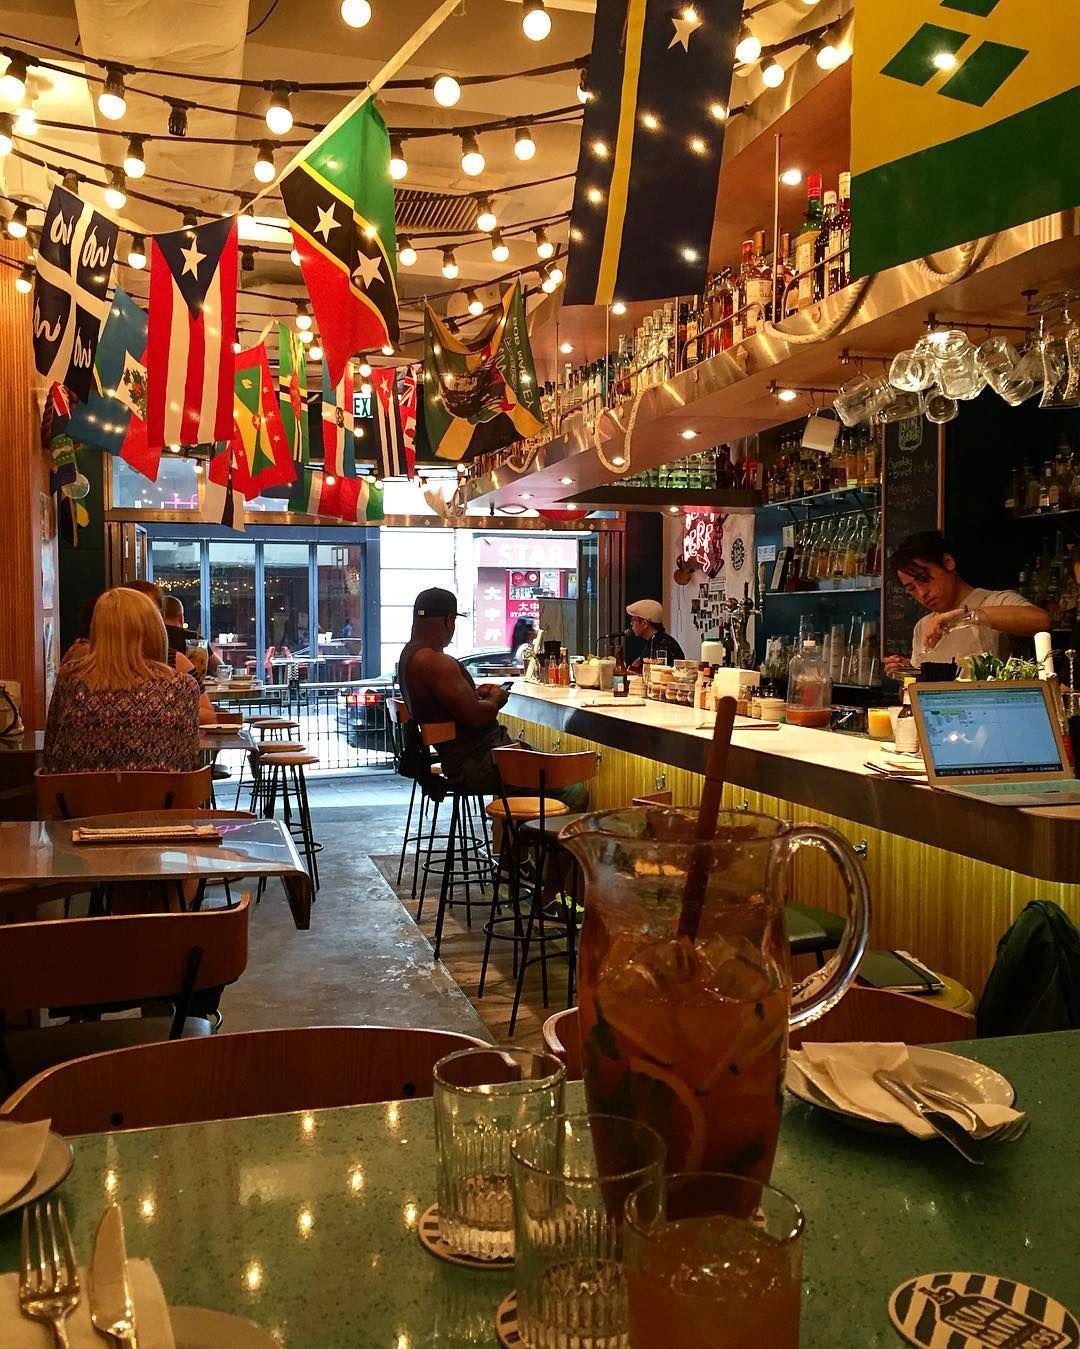 Another Jerk brunch with @notheather @jaysicles  Free flow Caribbean pimms and meat with live music. Happy Saturday 홍콩에서 제일 좋아하는 브런치 장소! 2시간동안 무제한 자메이카 바베큐와 술 라이브 뮤직을 즐길 수 있다는. 게다가 음식이 진짜 너무 맛있음 ㅠ 홍콩에 오심 꼭 와보세요! #brunch#hkeats#rummintings#jamaicanfood#brunchhk#hkig#hongkong#weekendbrunch#girlsbrunch#852#홍콩맛집#자메이카음식#주말브런치#브런치#러민팅스#소호맛집#홍콩라이프 by kimjiyeonkimchi